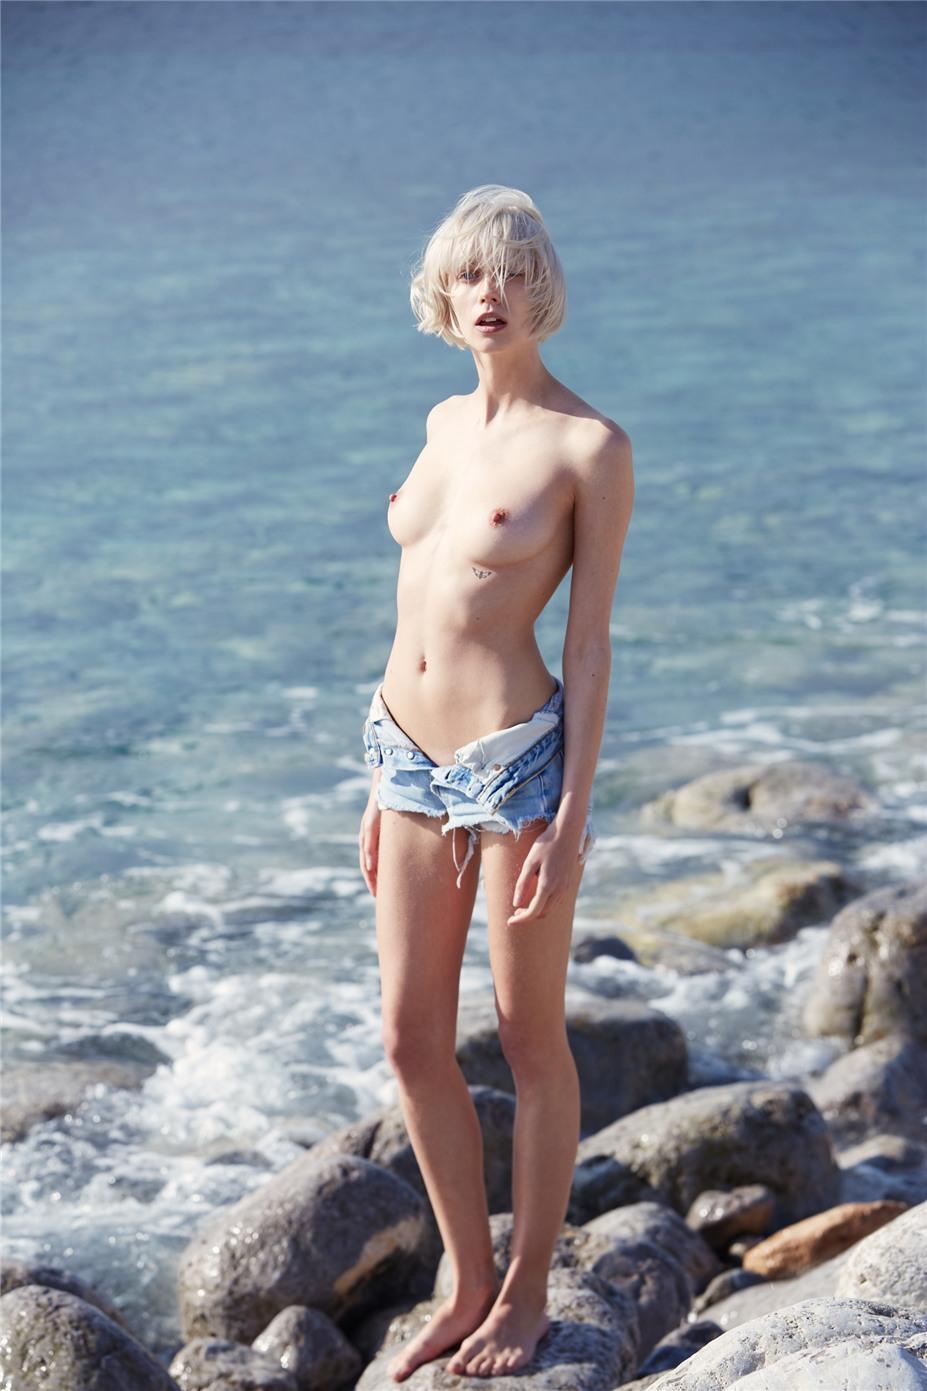 Обнаженные девушки на пляжах Ибицы / Ibiza Nudes by Diane Betties - Aleks